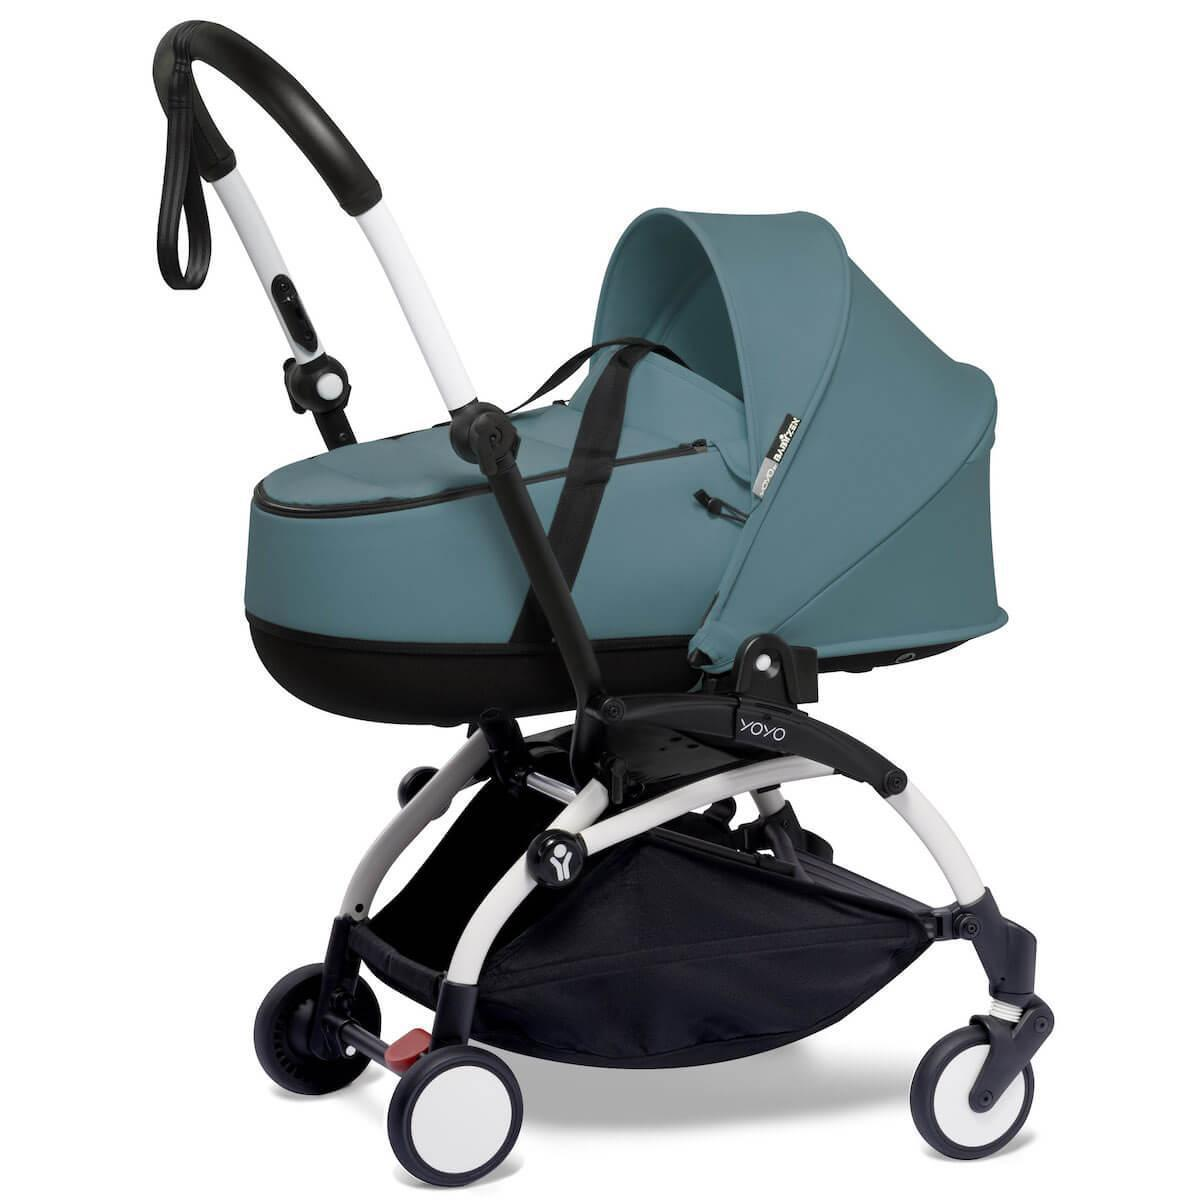 Kinderwagen BABYZEN YOYO²  all-in-one Wanne/Autositz/6+ weiß-aqua